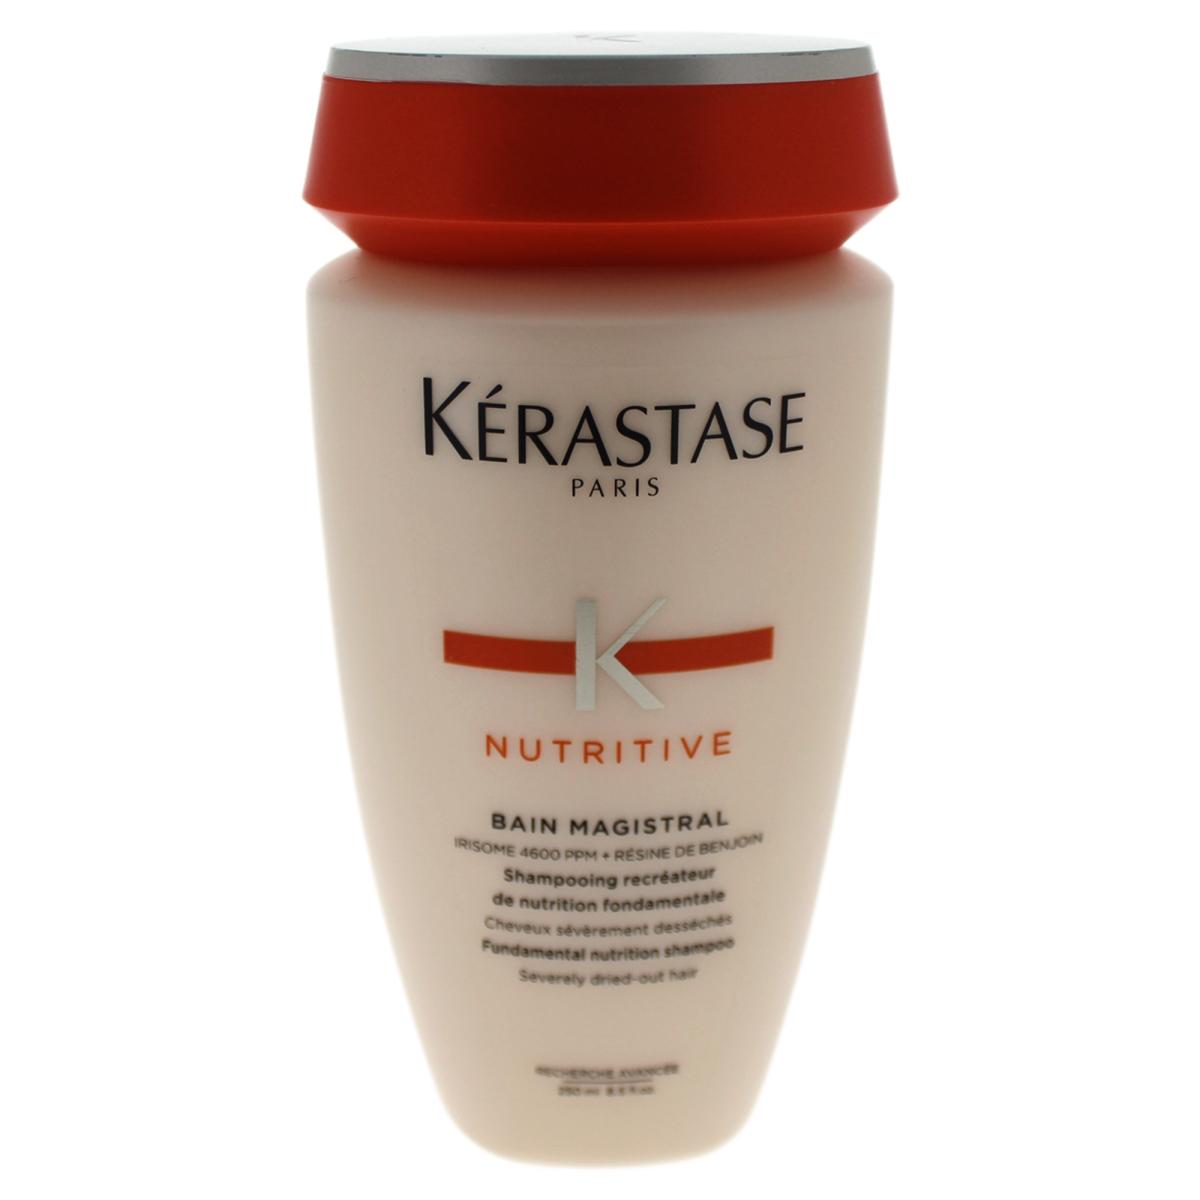 Kerastase U-HC-11197 Nutritive Bain Magistral Shampoo for Unisex - 8.5 oz